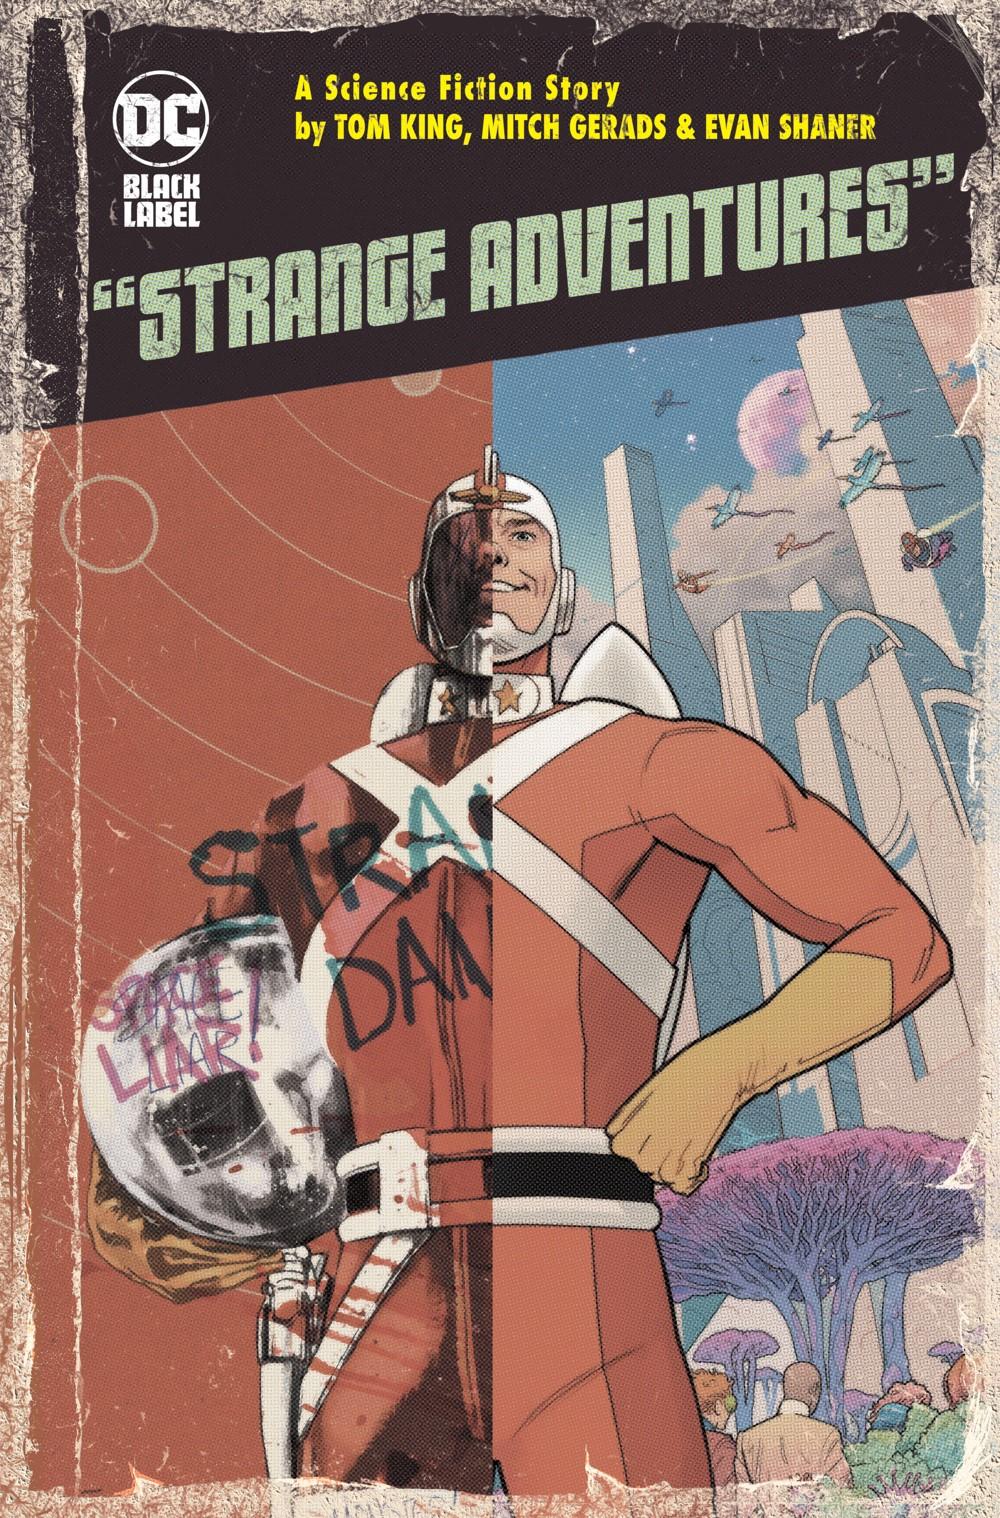 STRANGEADVENTURES_Trade DC Comics November 2021 Solicitations